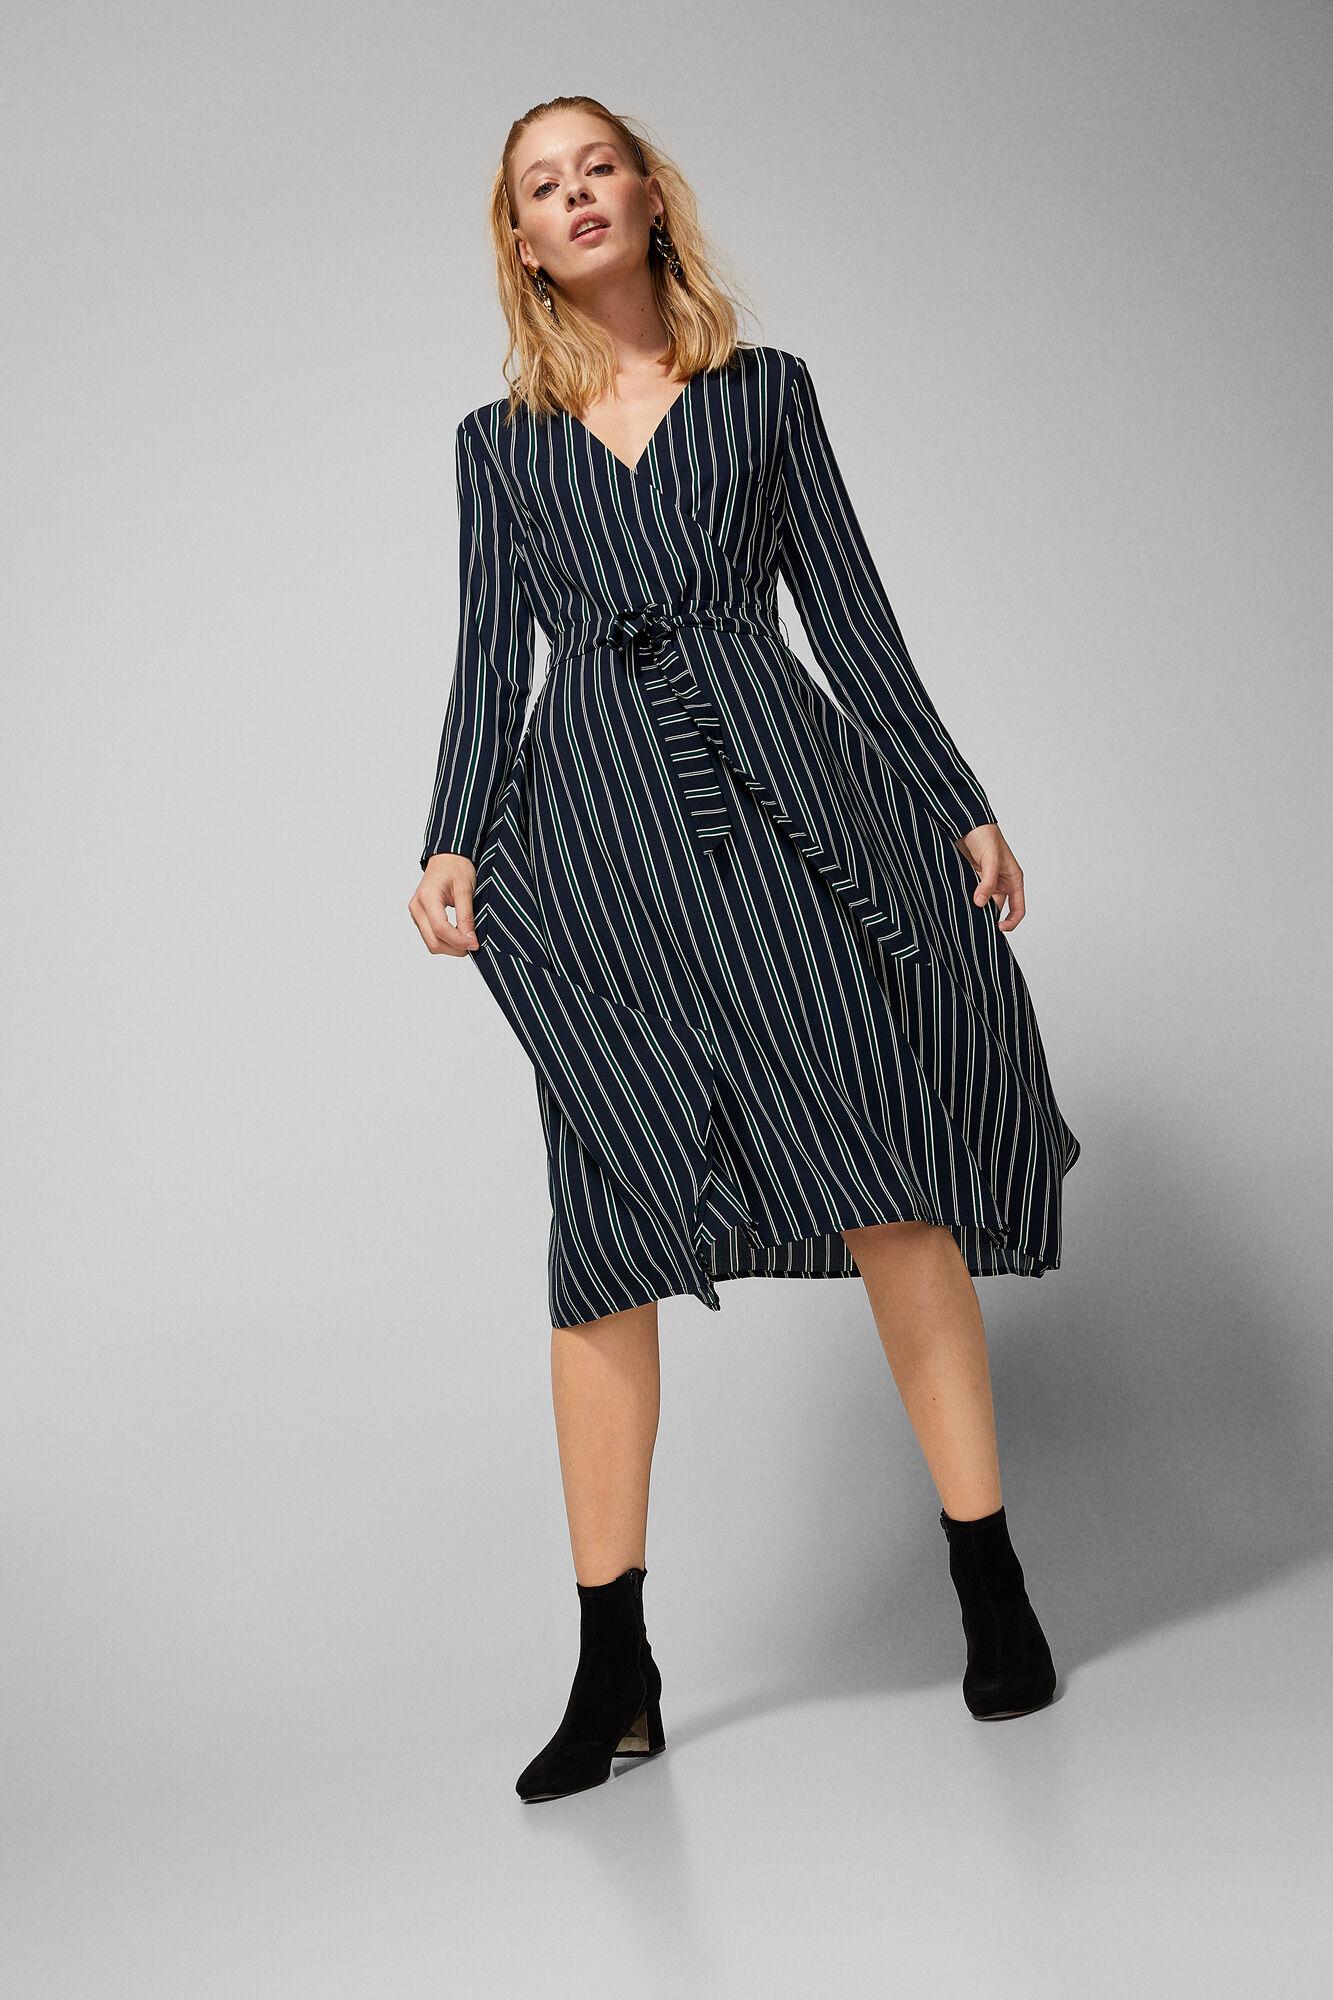 Asymmetric Striped Dress Dresses Springfield Man Woman